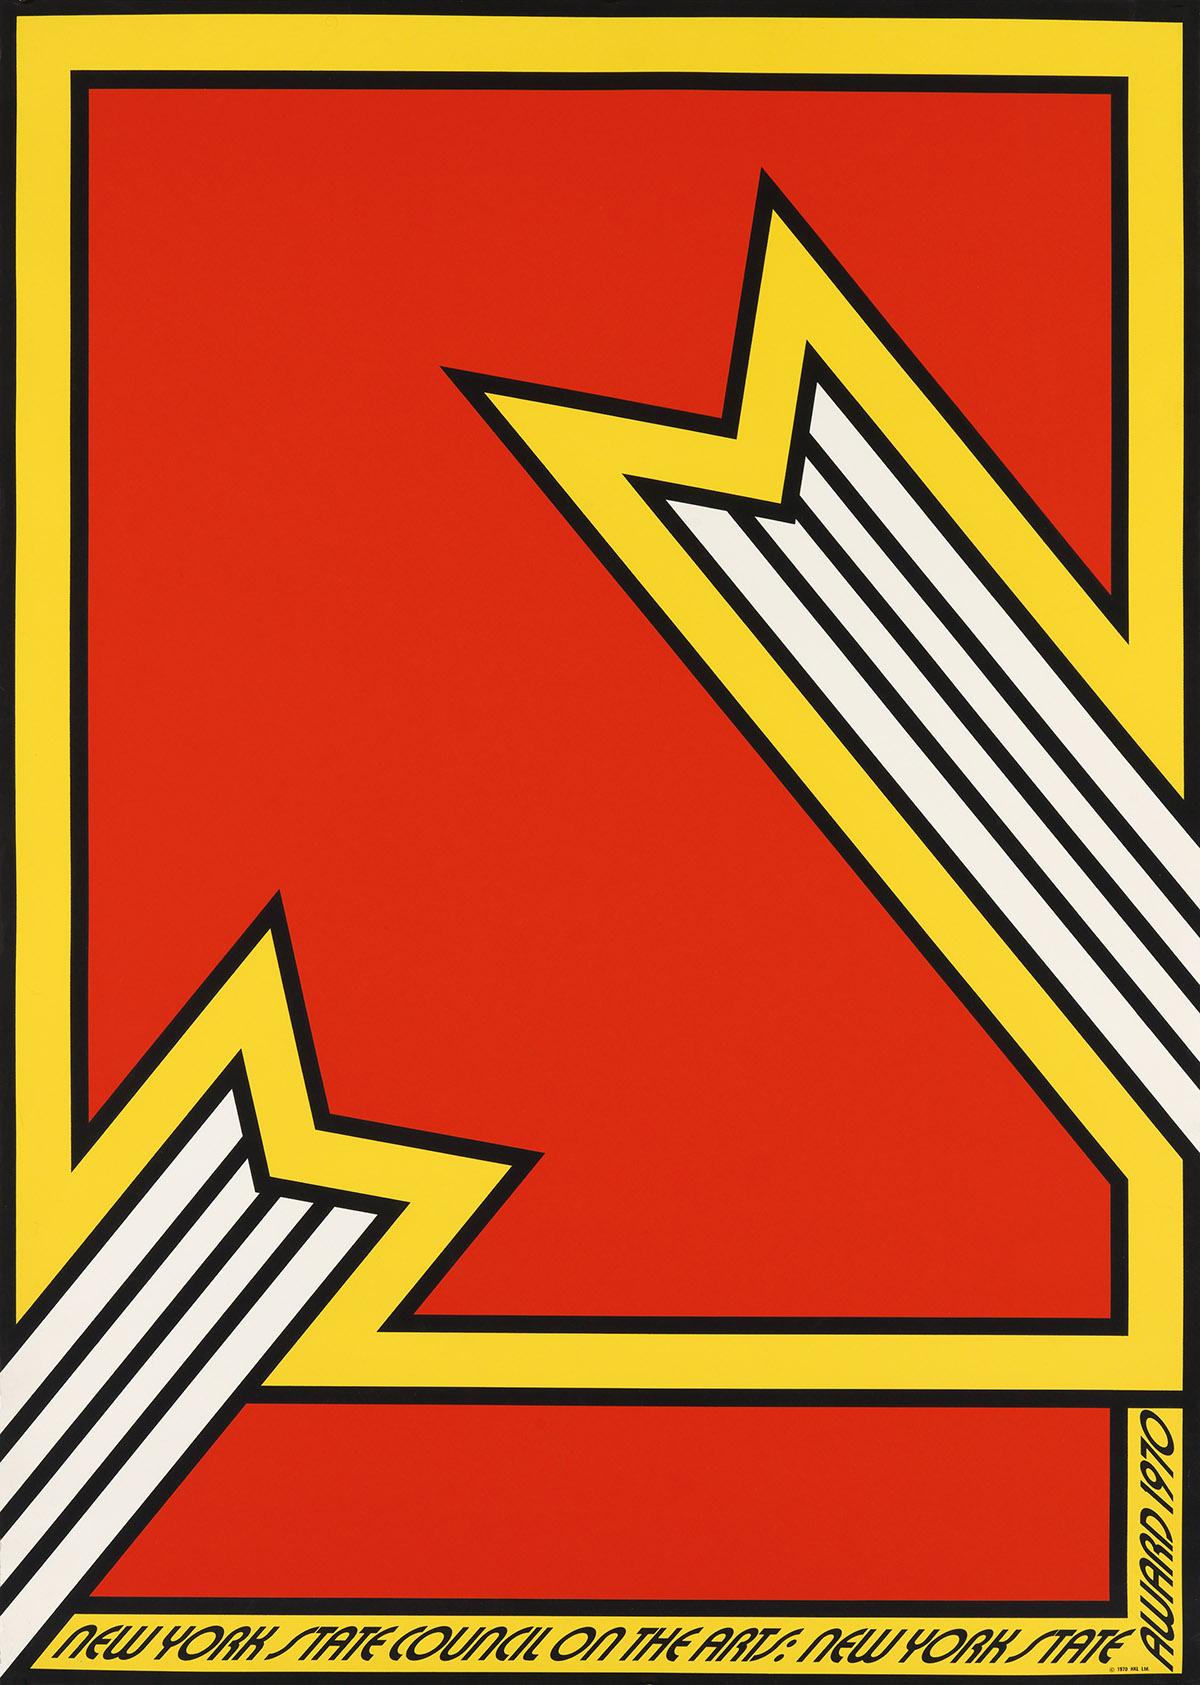 NICHOLAS-KRUSHENICK-(1929-1999)-NEW-YORK-STATE-COUNCIL-ON-TH